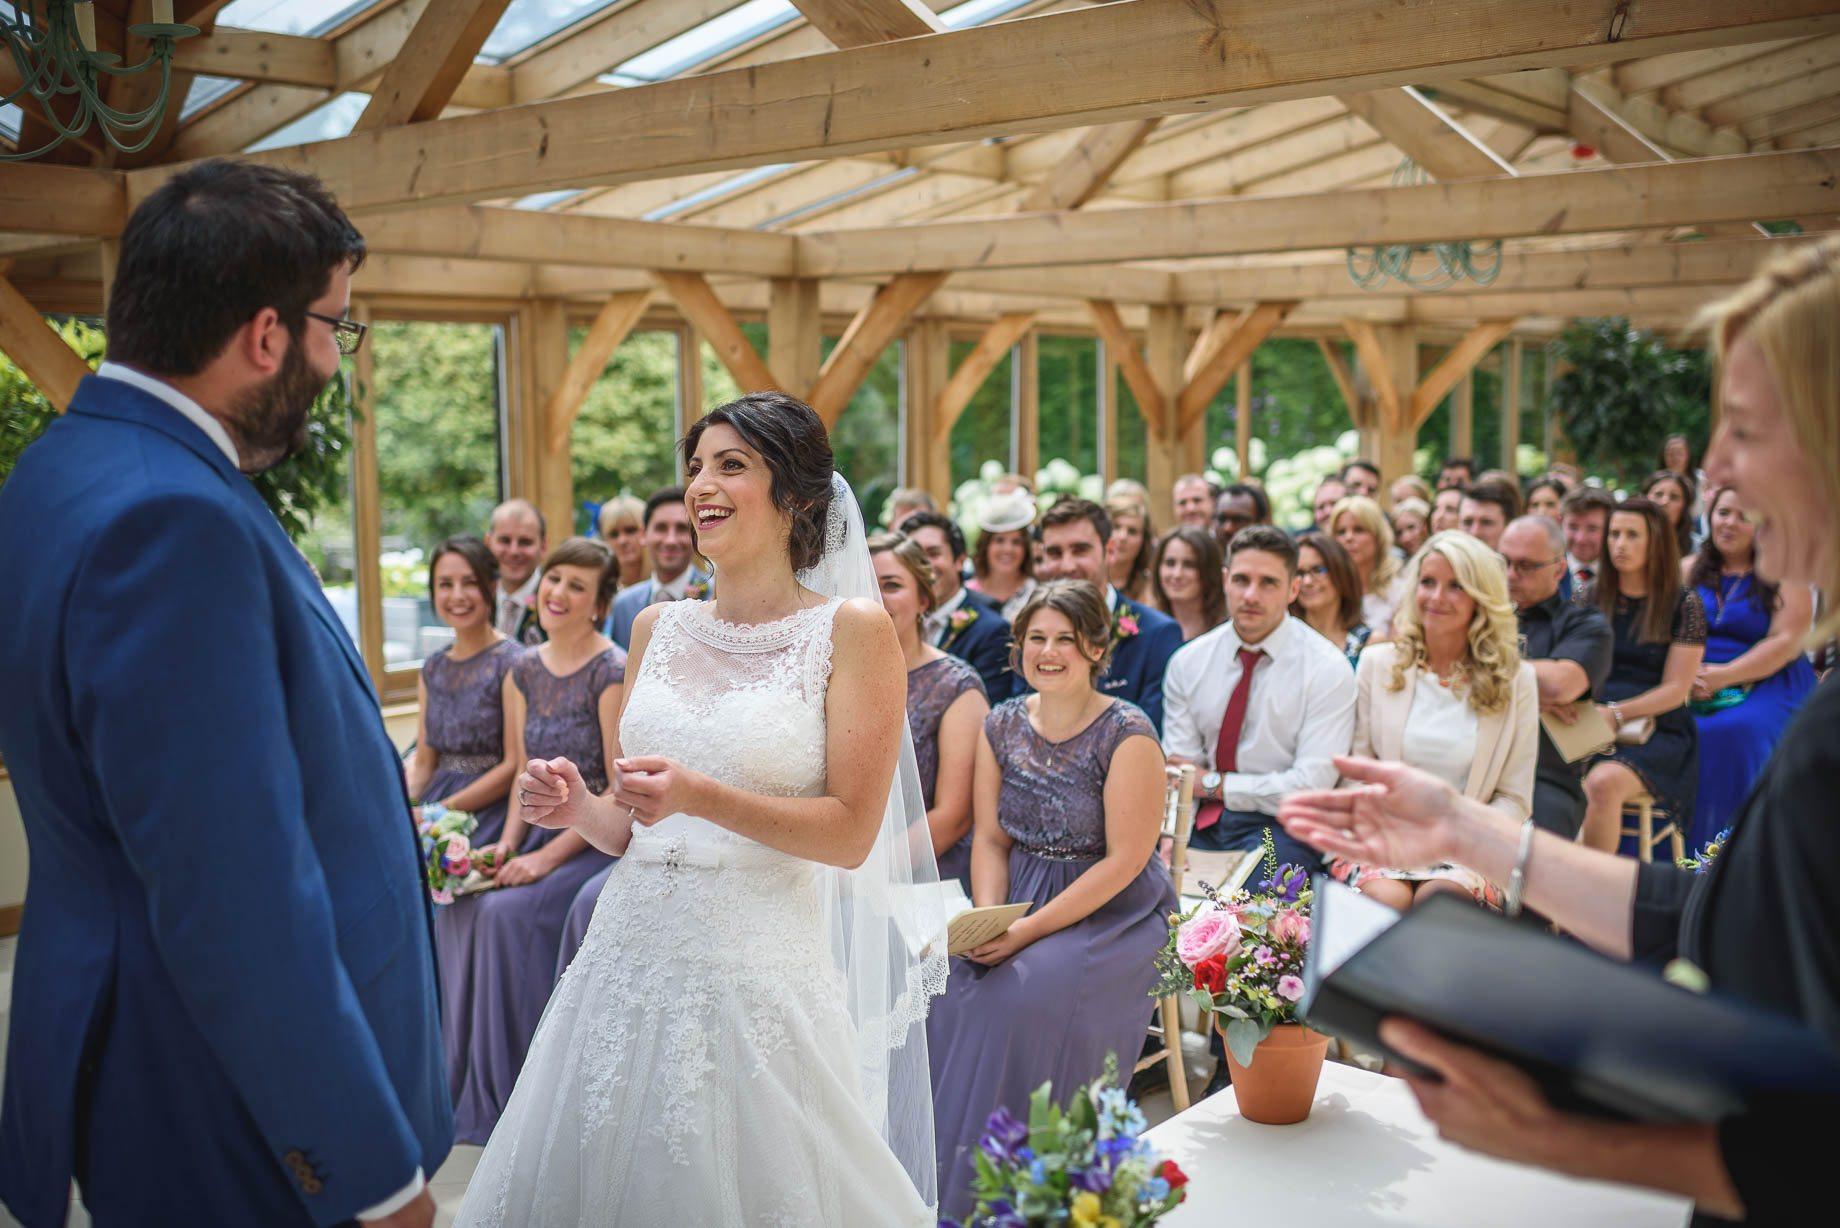 Gaynes Park wedding photography - Guy Collier Photography - Rachel and Jon (71 of 169)